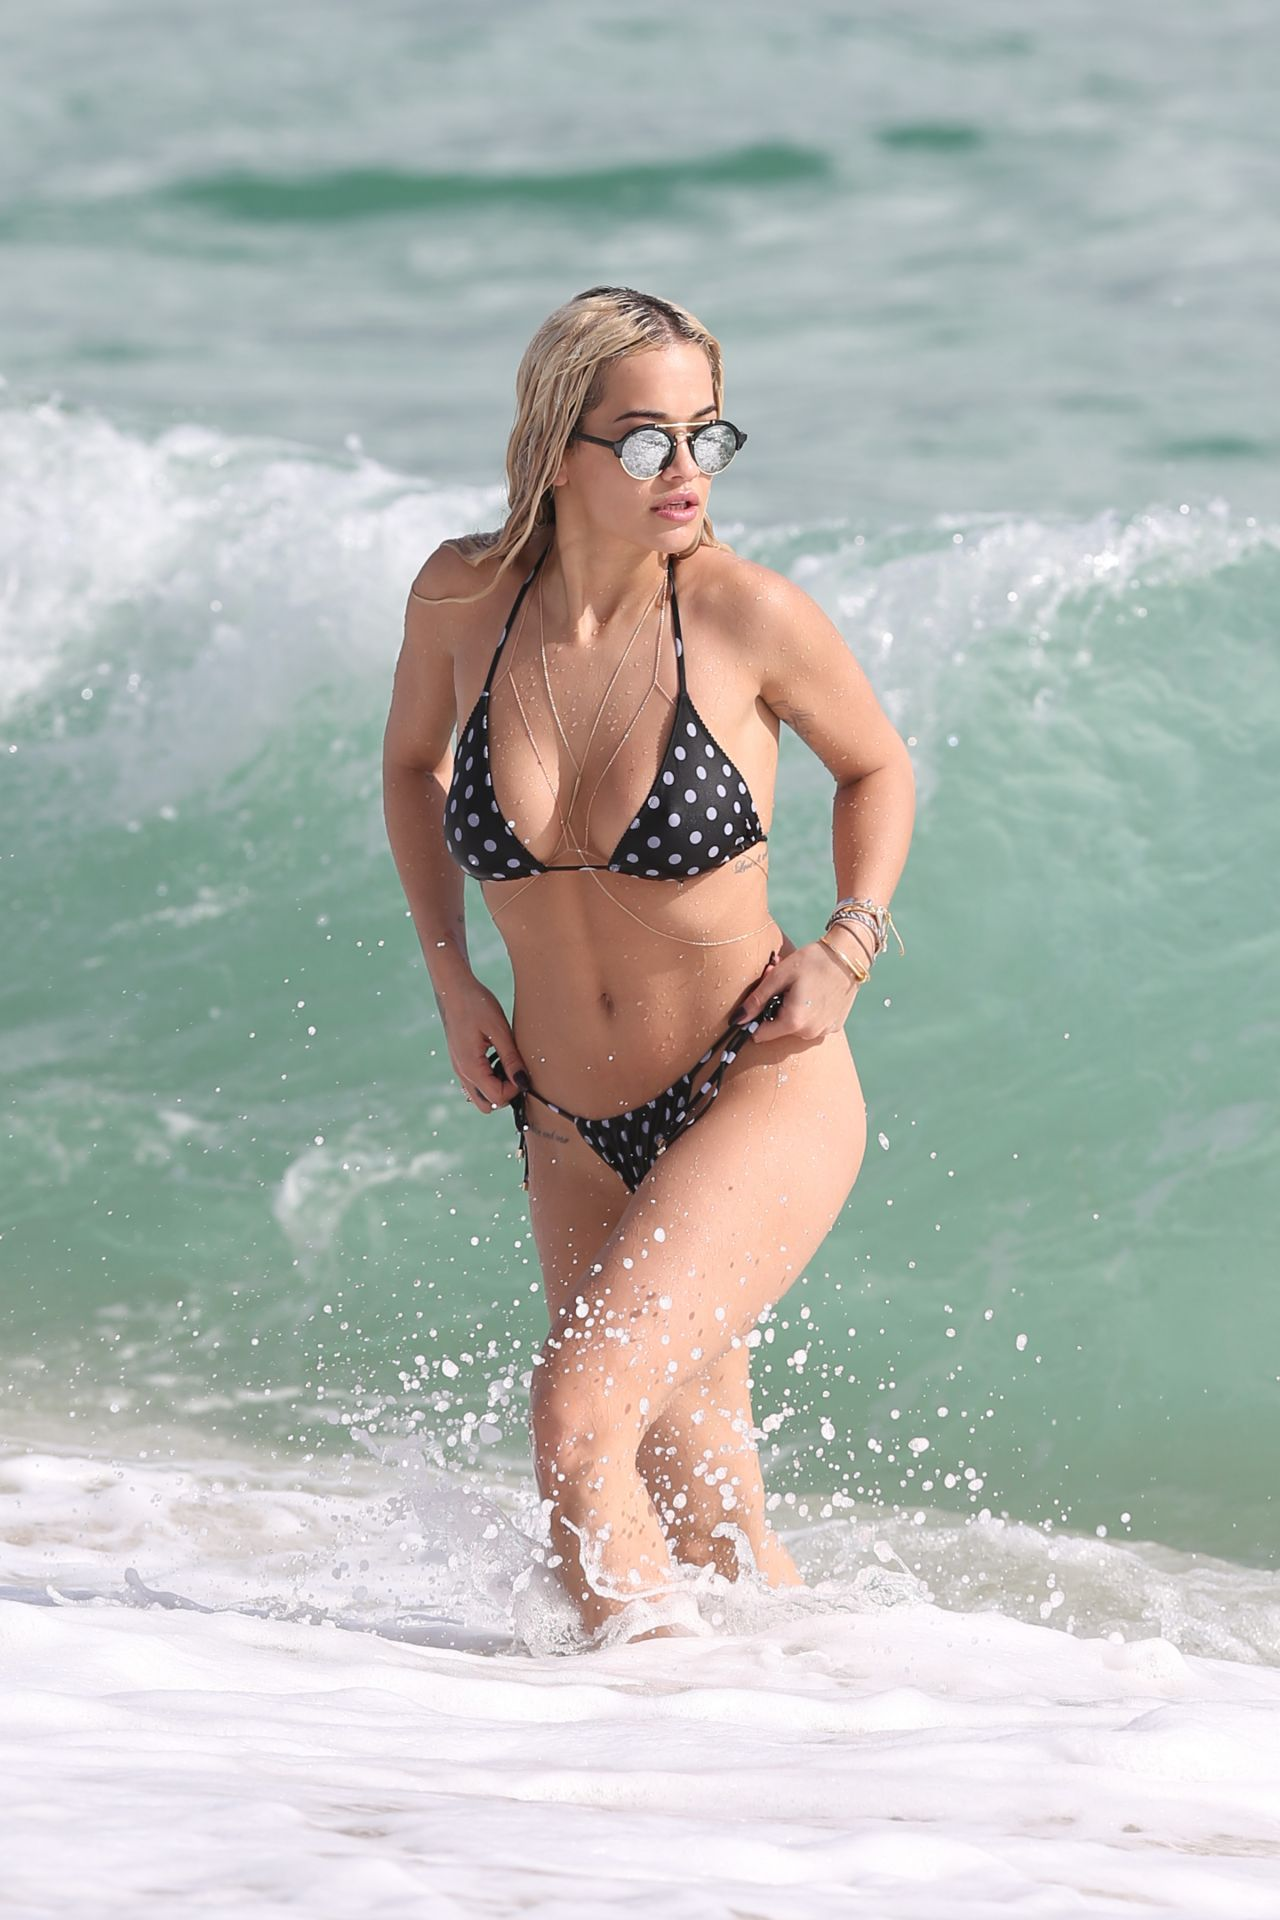 Genevieve morton naked pics,Dasha Astafieva See Through  Erotic nude Mila Kunis Thong And Naked Pictures,Rachel Cook Nude Beach Photo Shoot